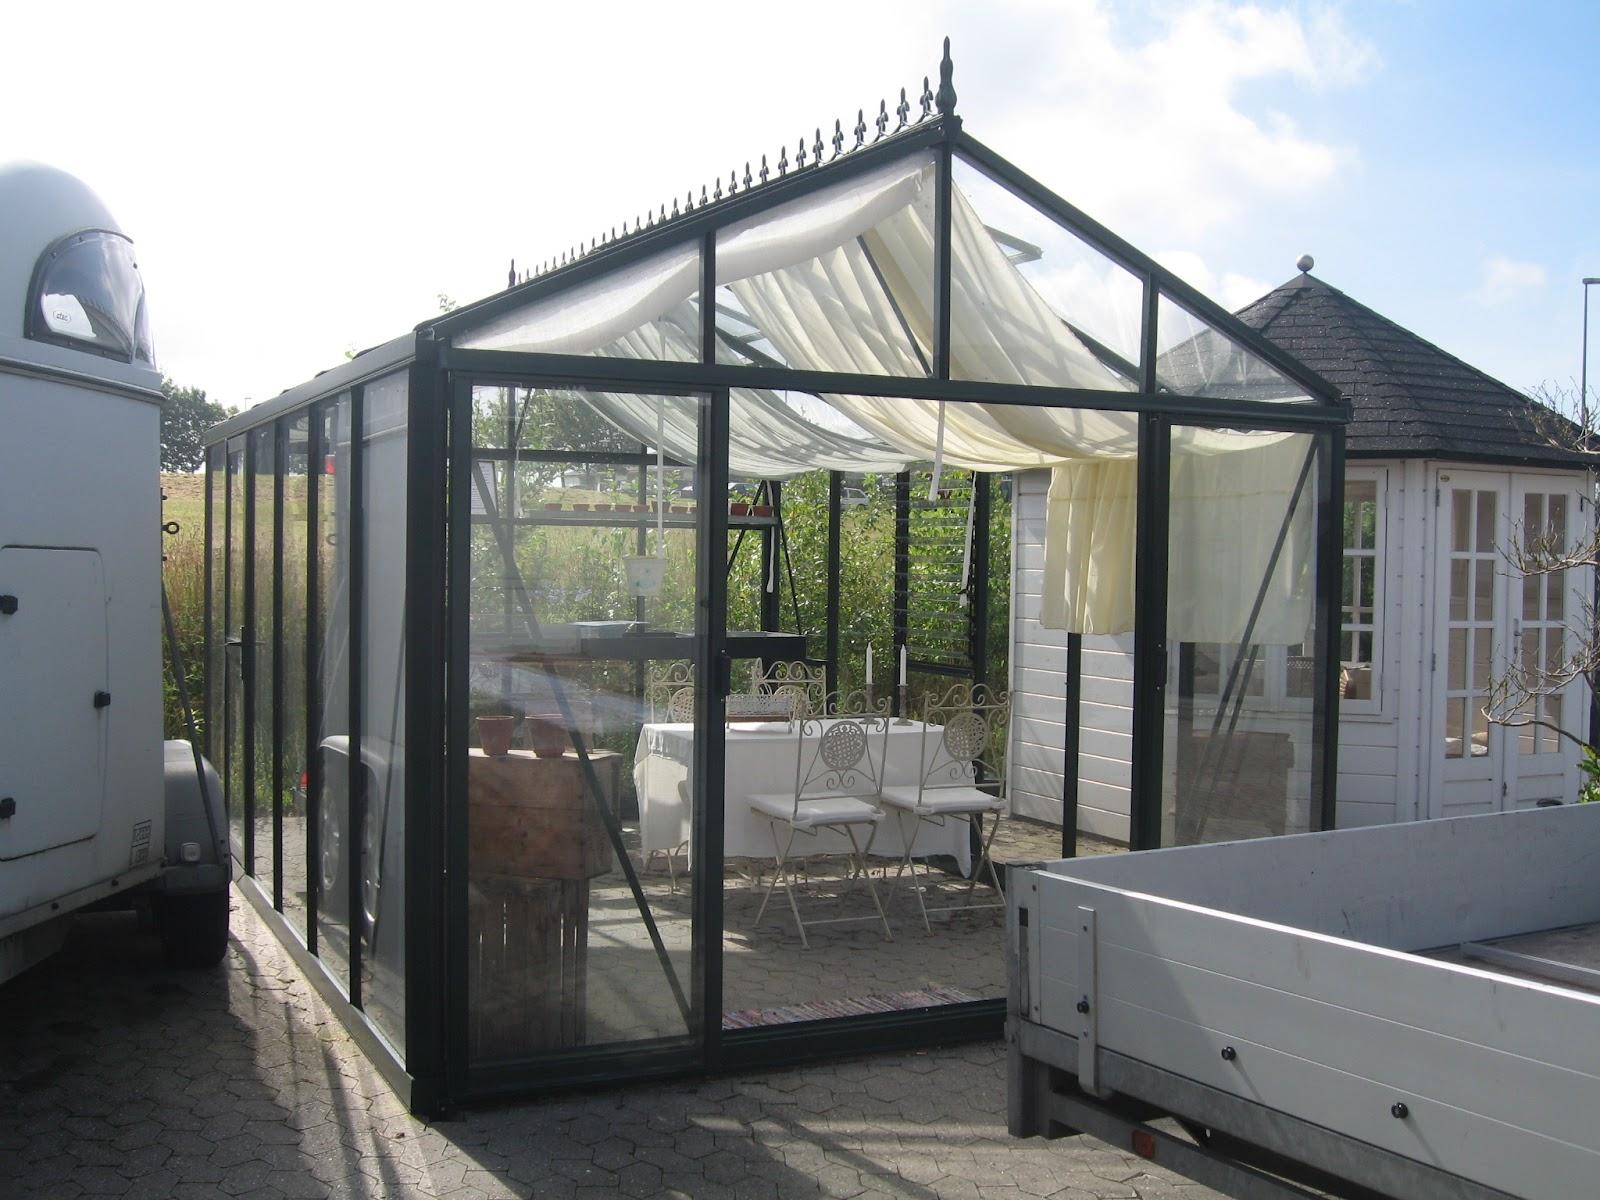 pavillon danmark. Black Bedroom Furniture Sets. Home Design Ideas